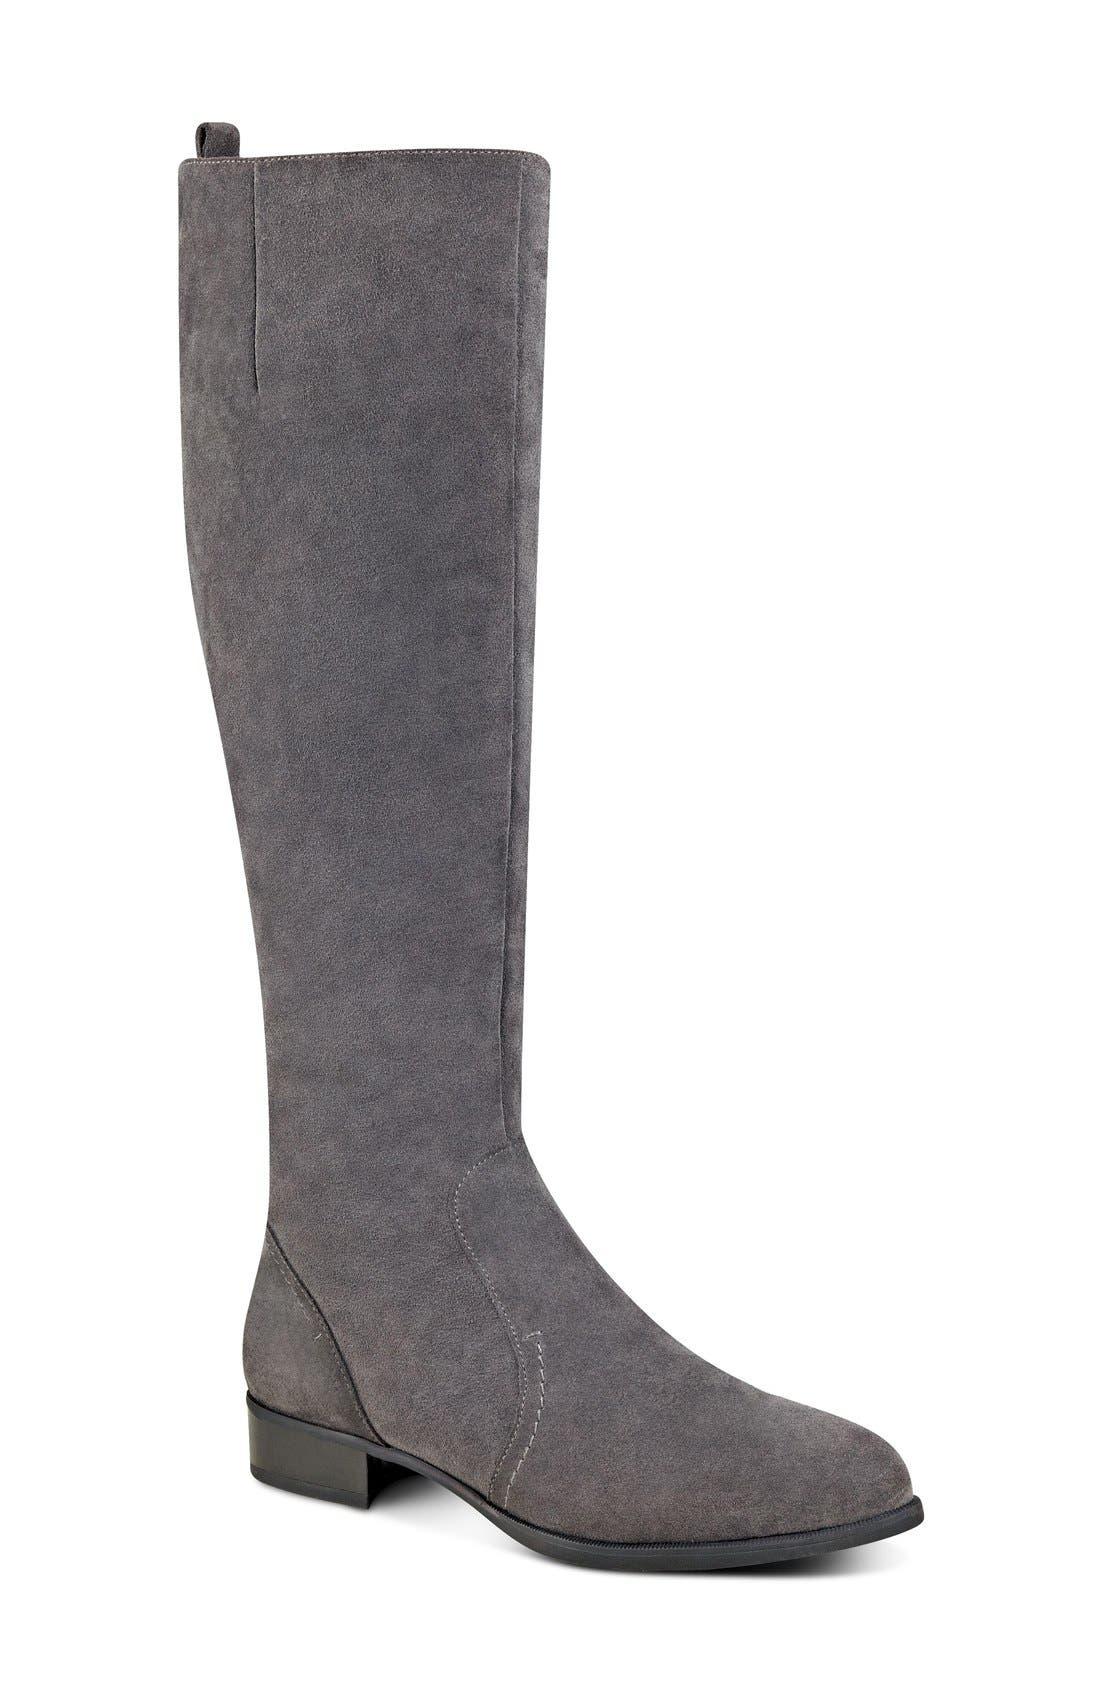 Alternate Image 1 Selected - Nine West 'Nicolah' Tall Boot (Women)